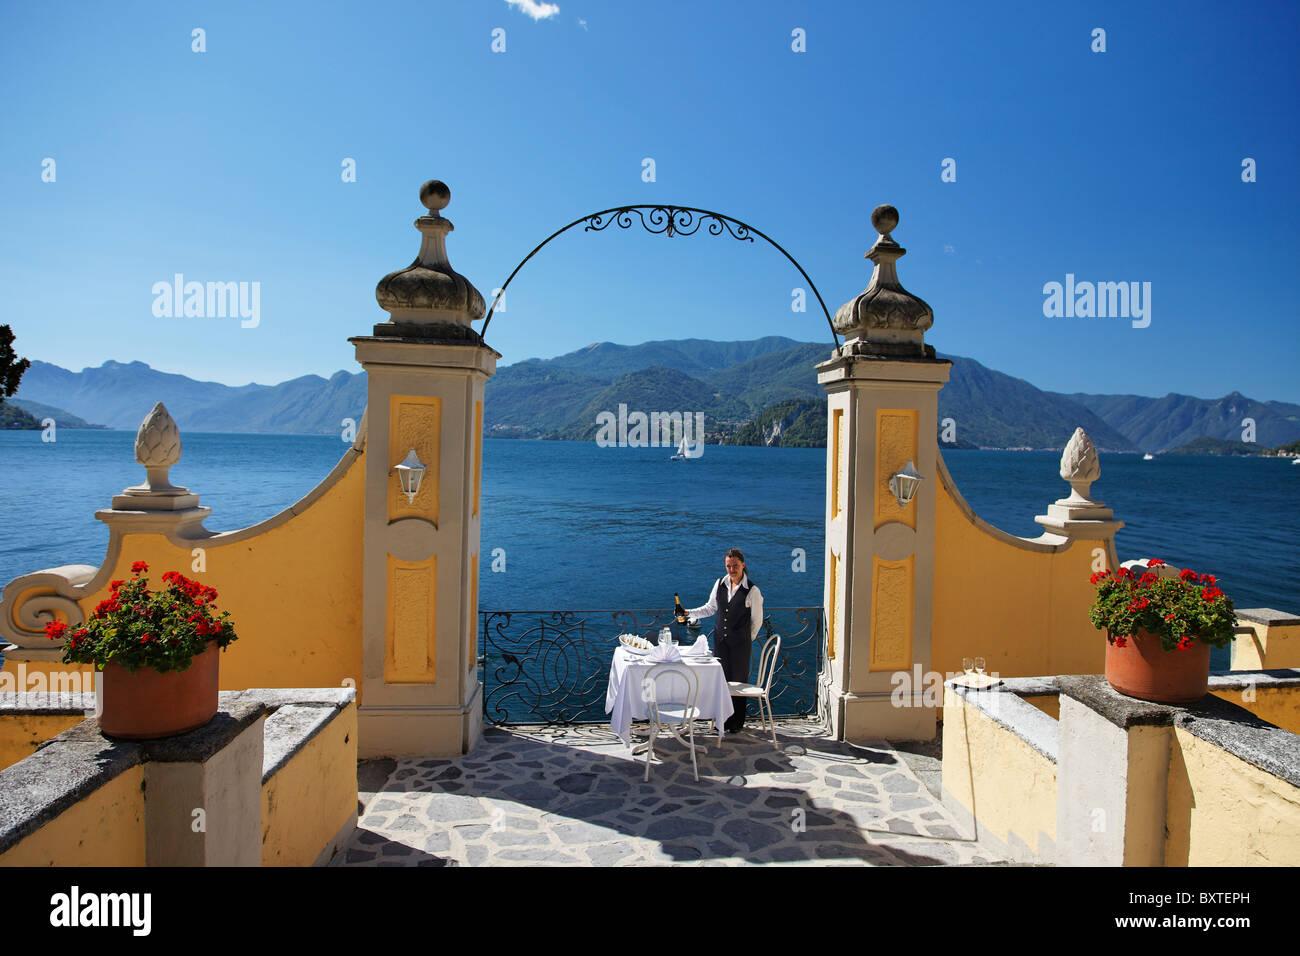 Hotel Royal Victoria Varenna Italy